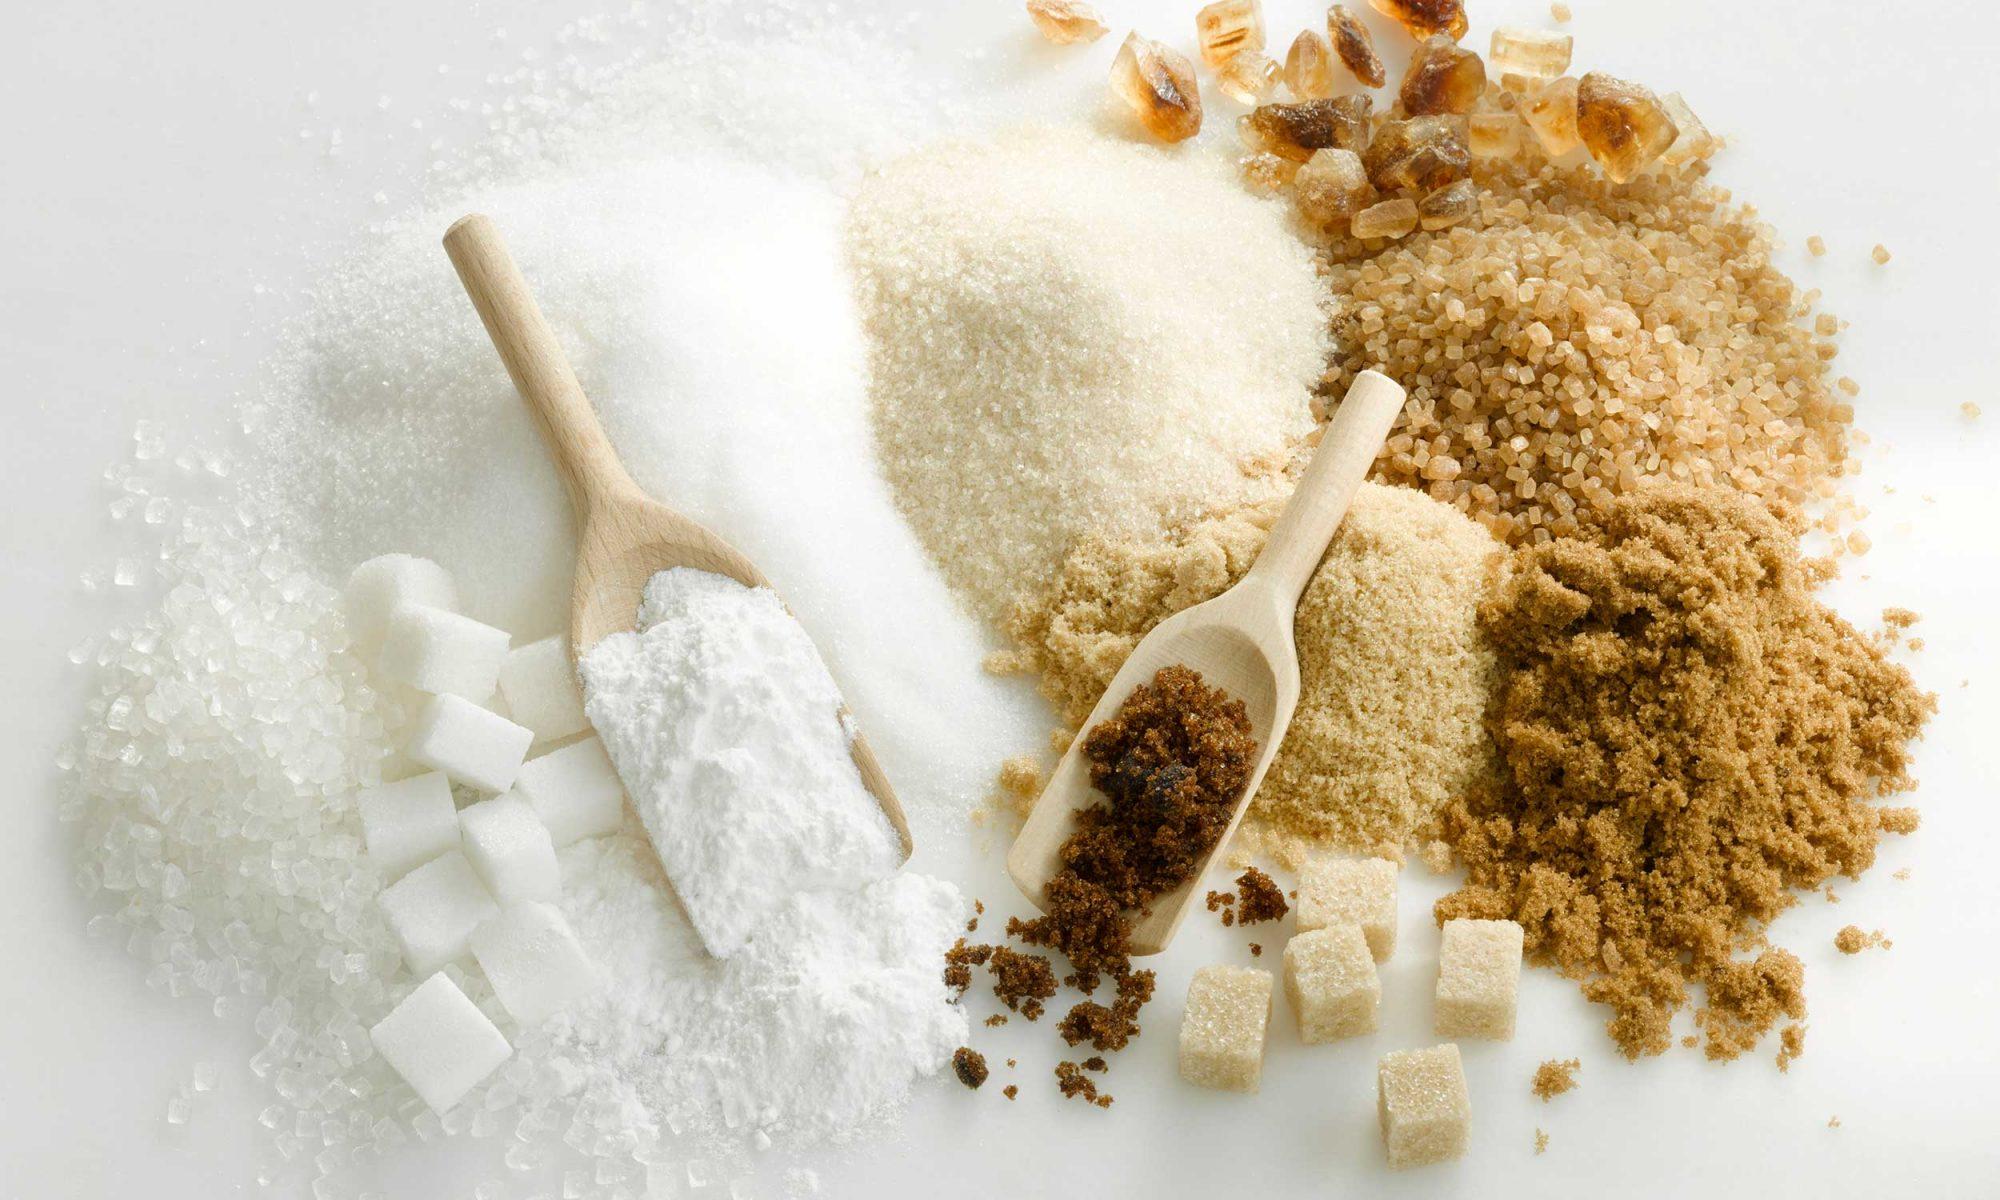 EC: Brown Sugar Substitutes for Last-Minute Bakers